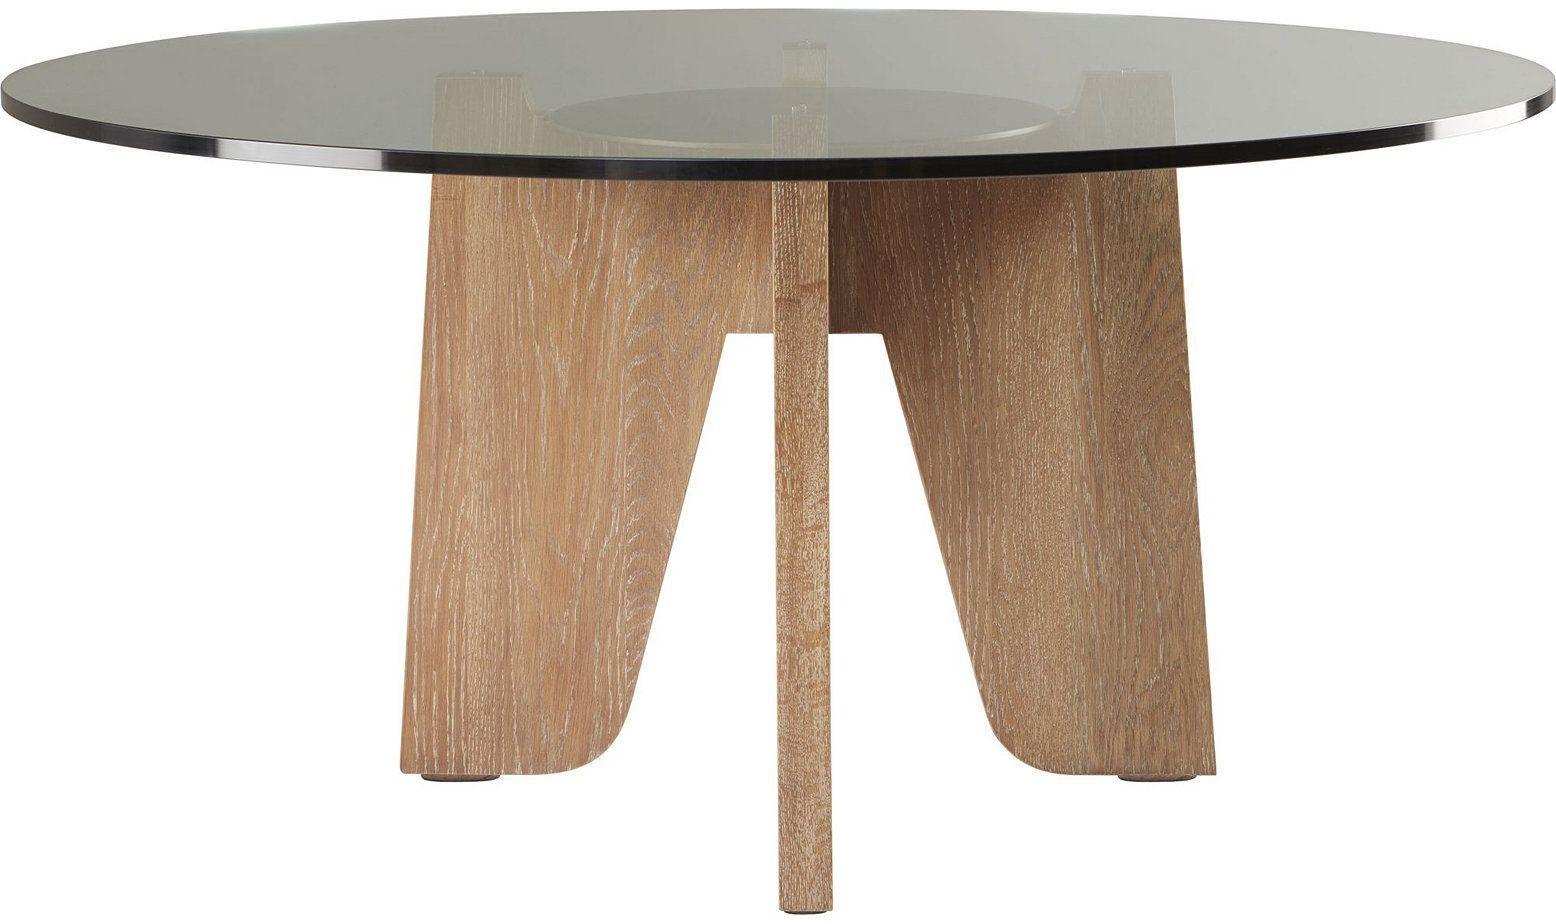 Ashley Furniture Urbanology Table But Bigger Living Room Table Sets Ashley Furniture Dining Hearth Room Decor